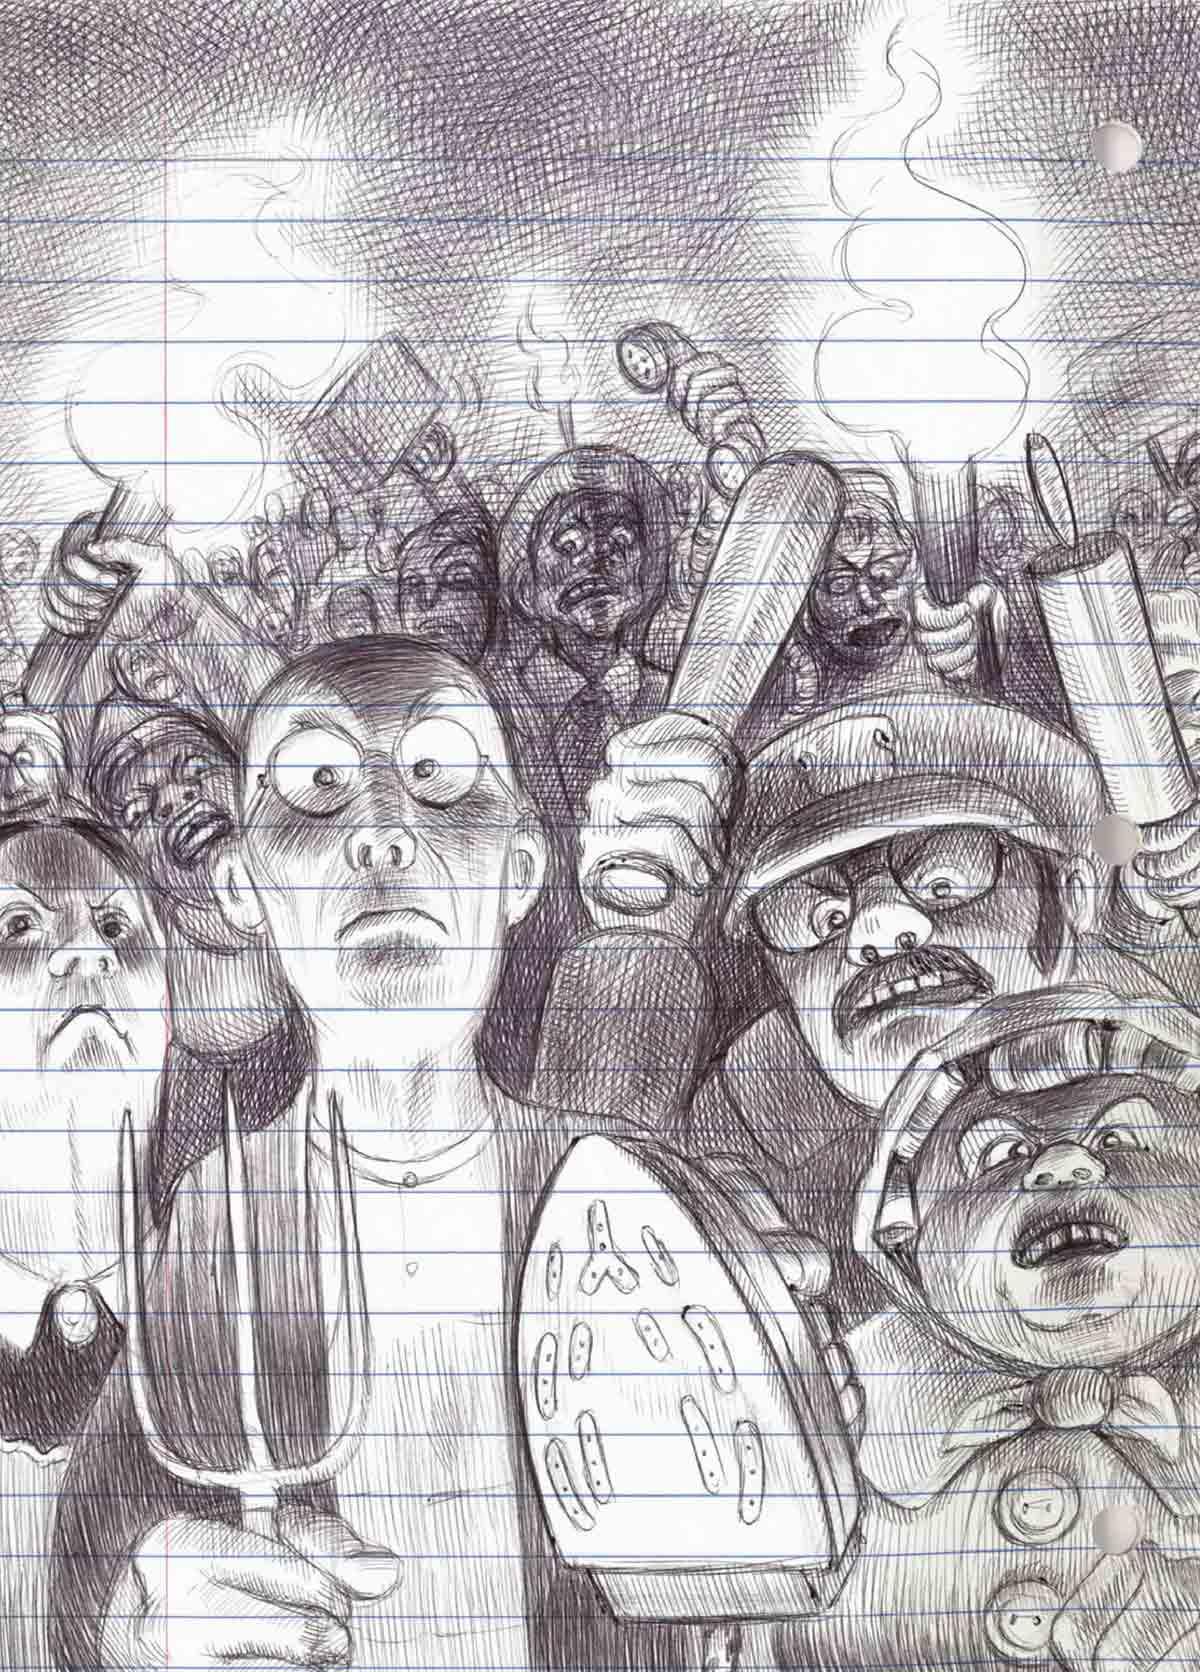 Golem-Comics-comic-Lo-que-mas-me-gusta-son-los-Monstruos-Emil-ferris-05